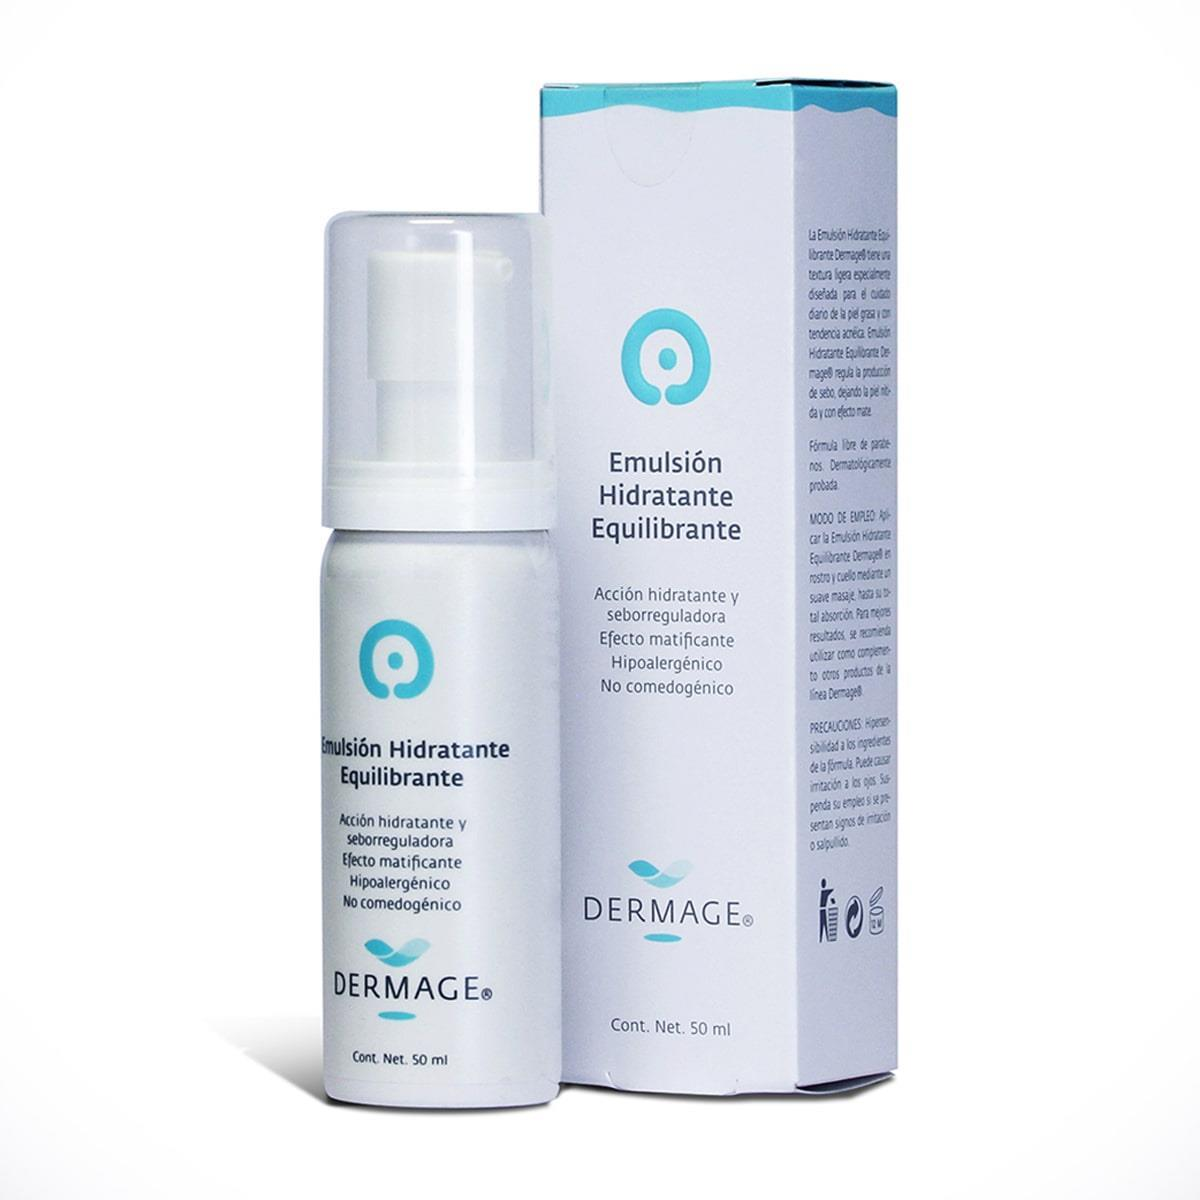 Dermage Emulsion Hidratante Equilibrante 50 Ml